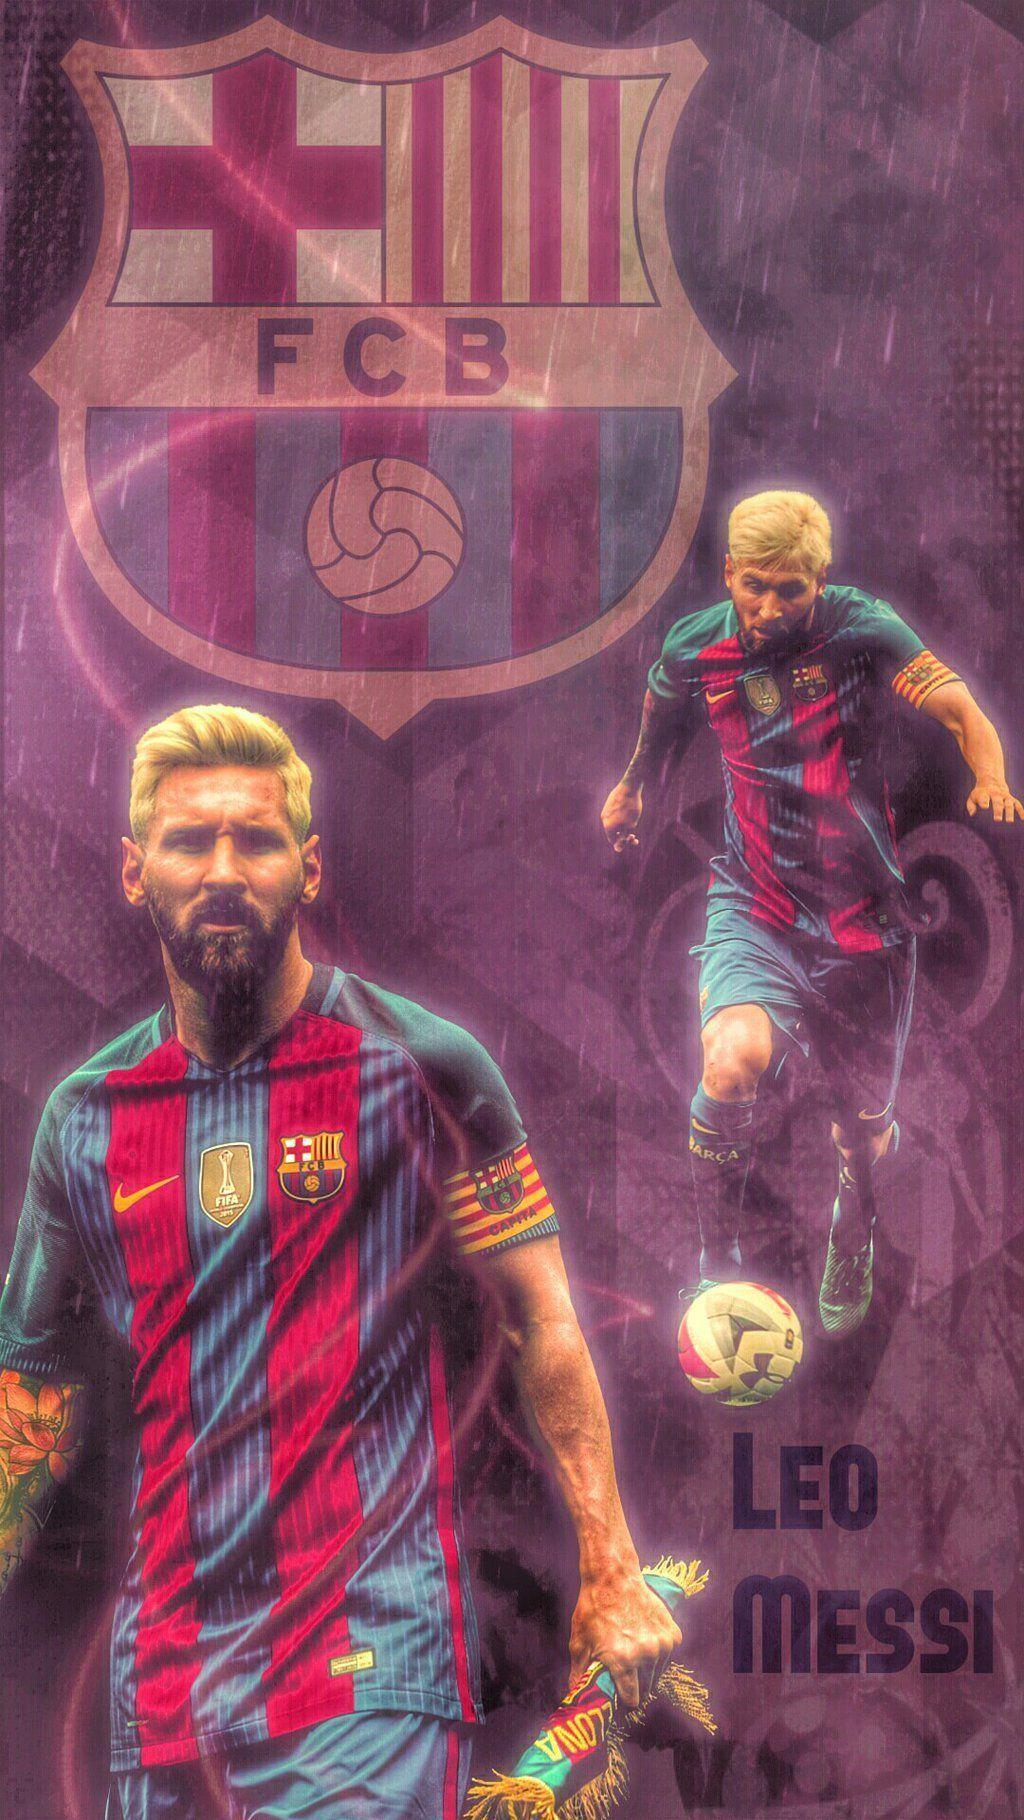 Messi Wallpapers 2017 >> Messi 2017 Wallpapers - Wallpaper Cave